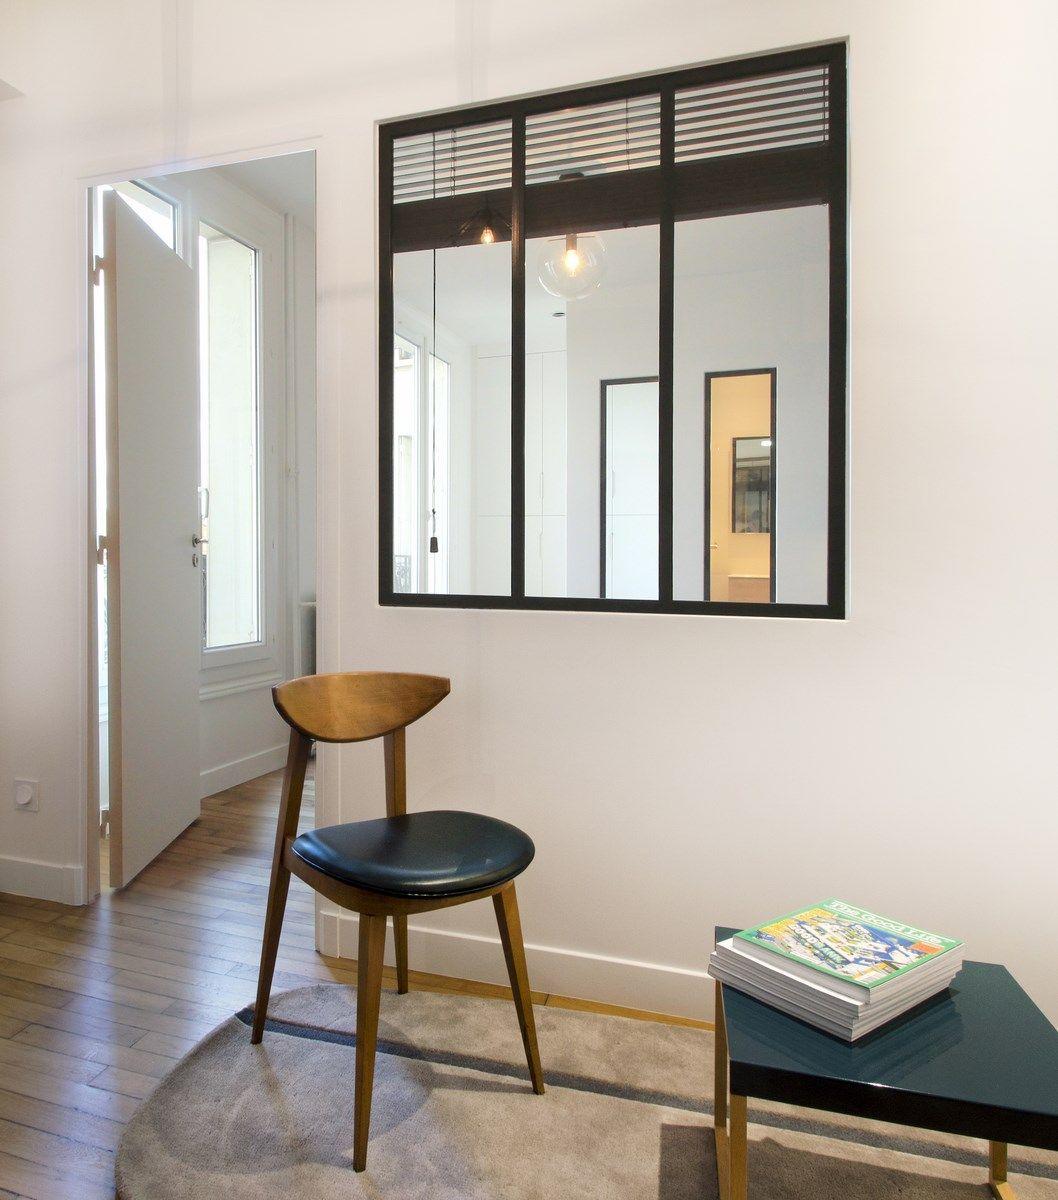 Однокомнатная квартира в стиле минимализм монохромная